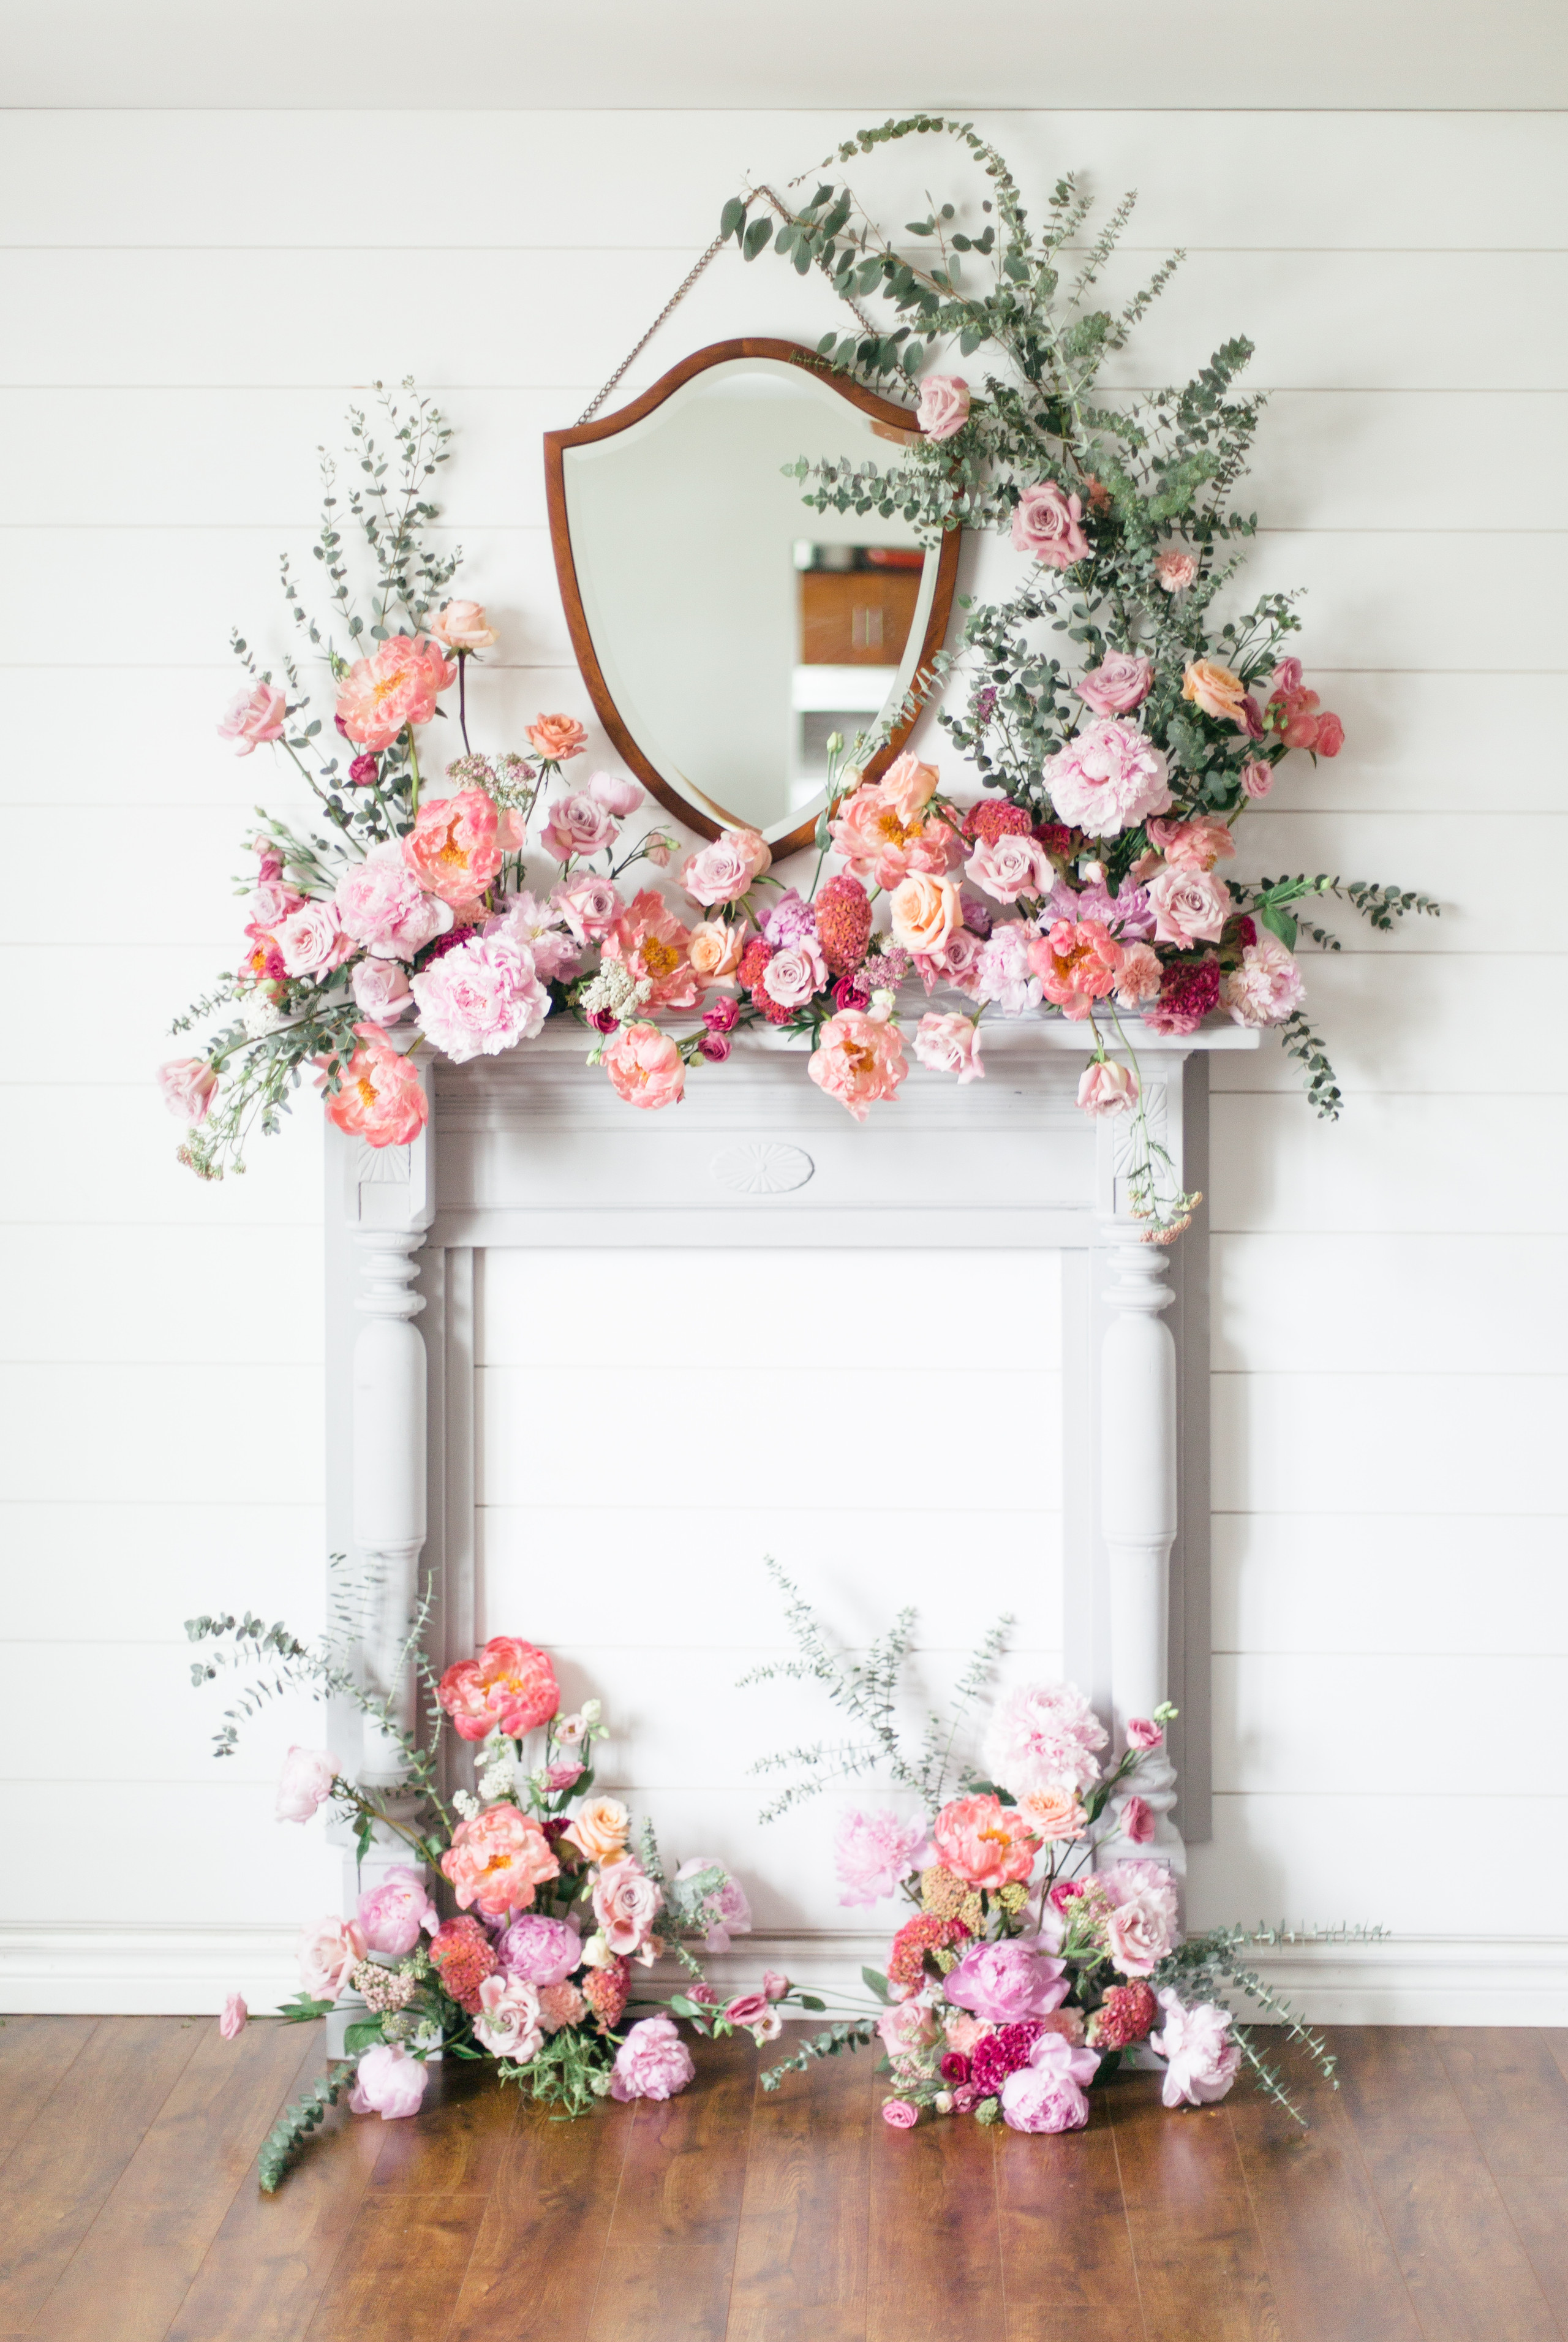 Floral arbor on fireplace for elopement inspiration, Halifax Nova Scotia Wedding